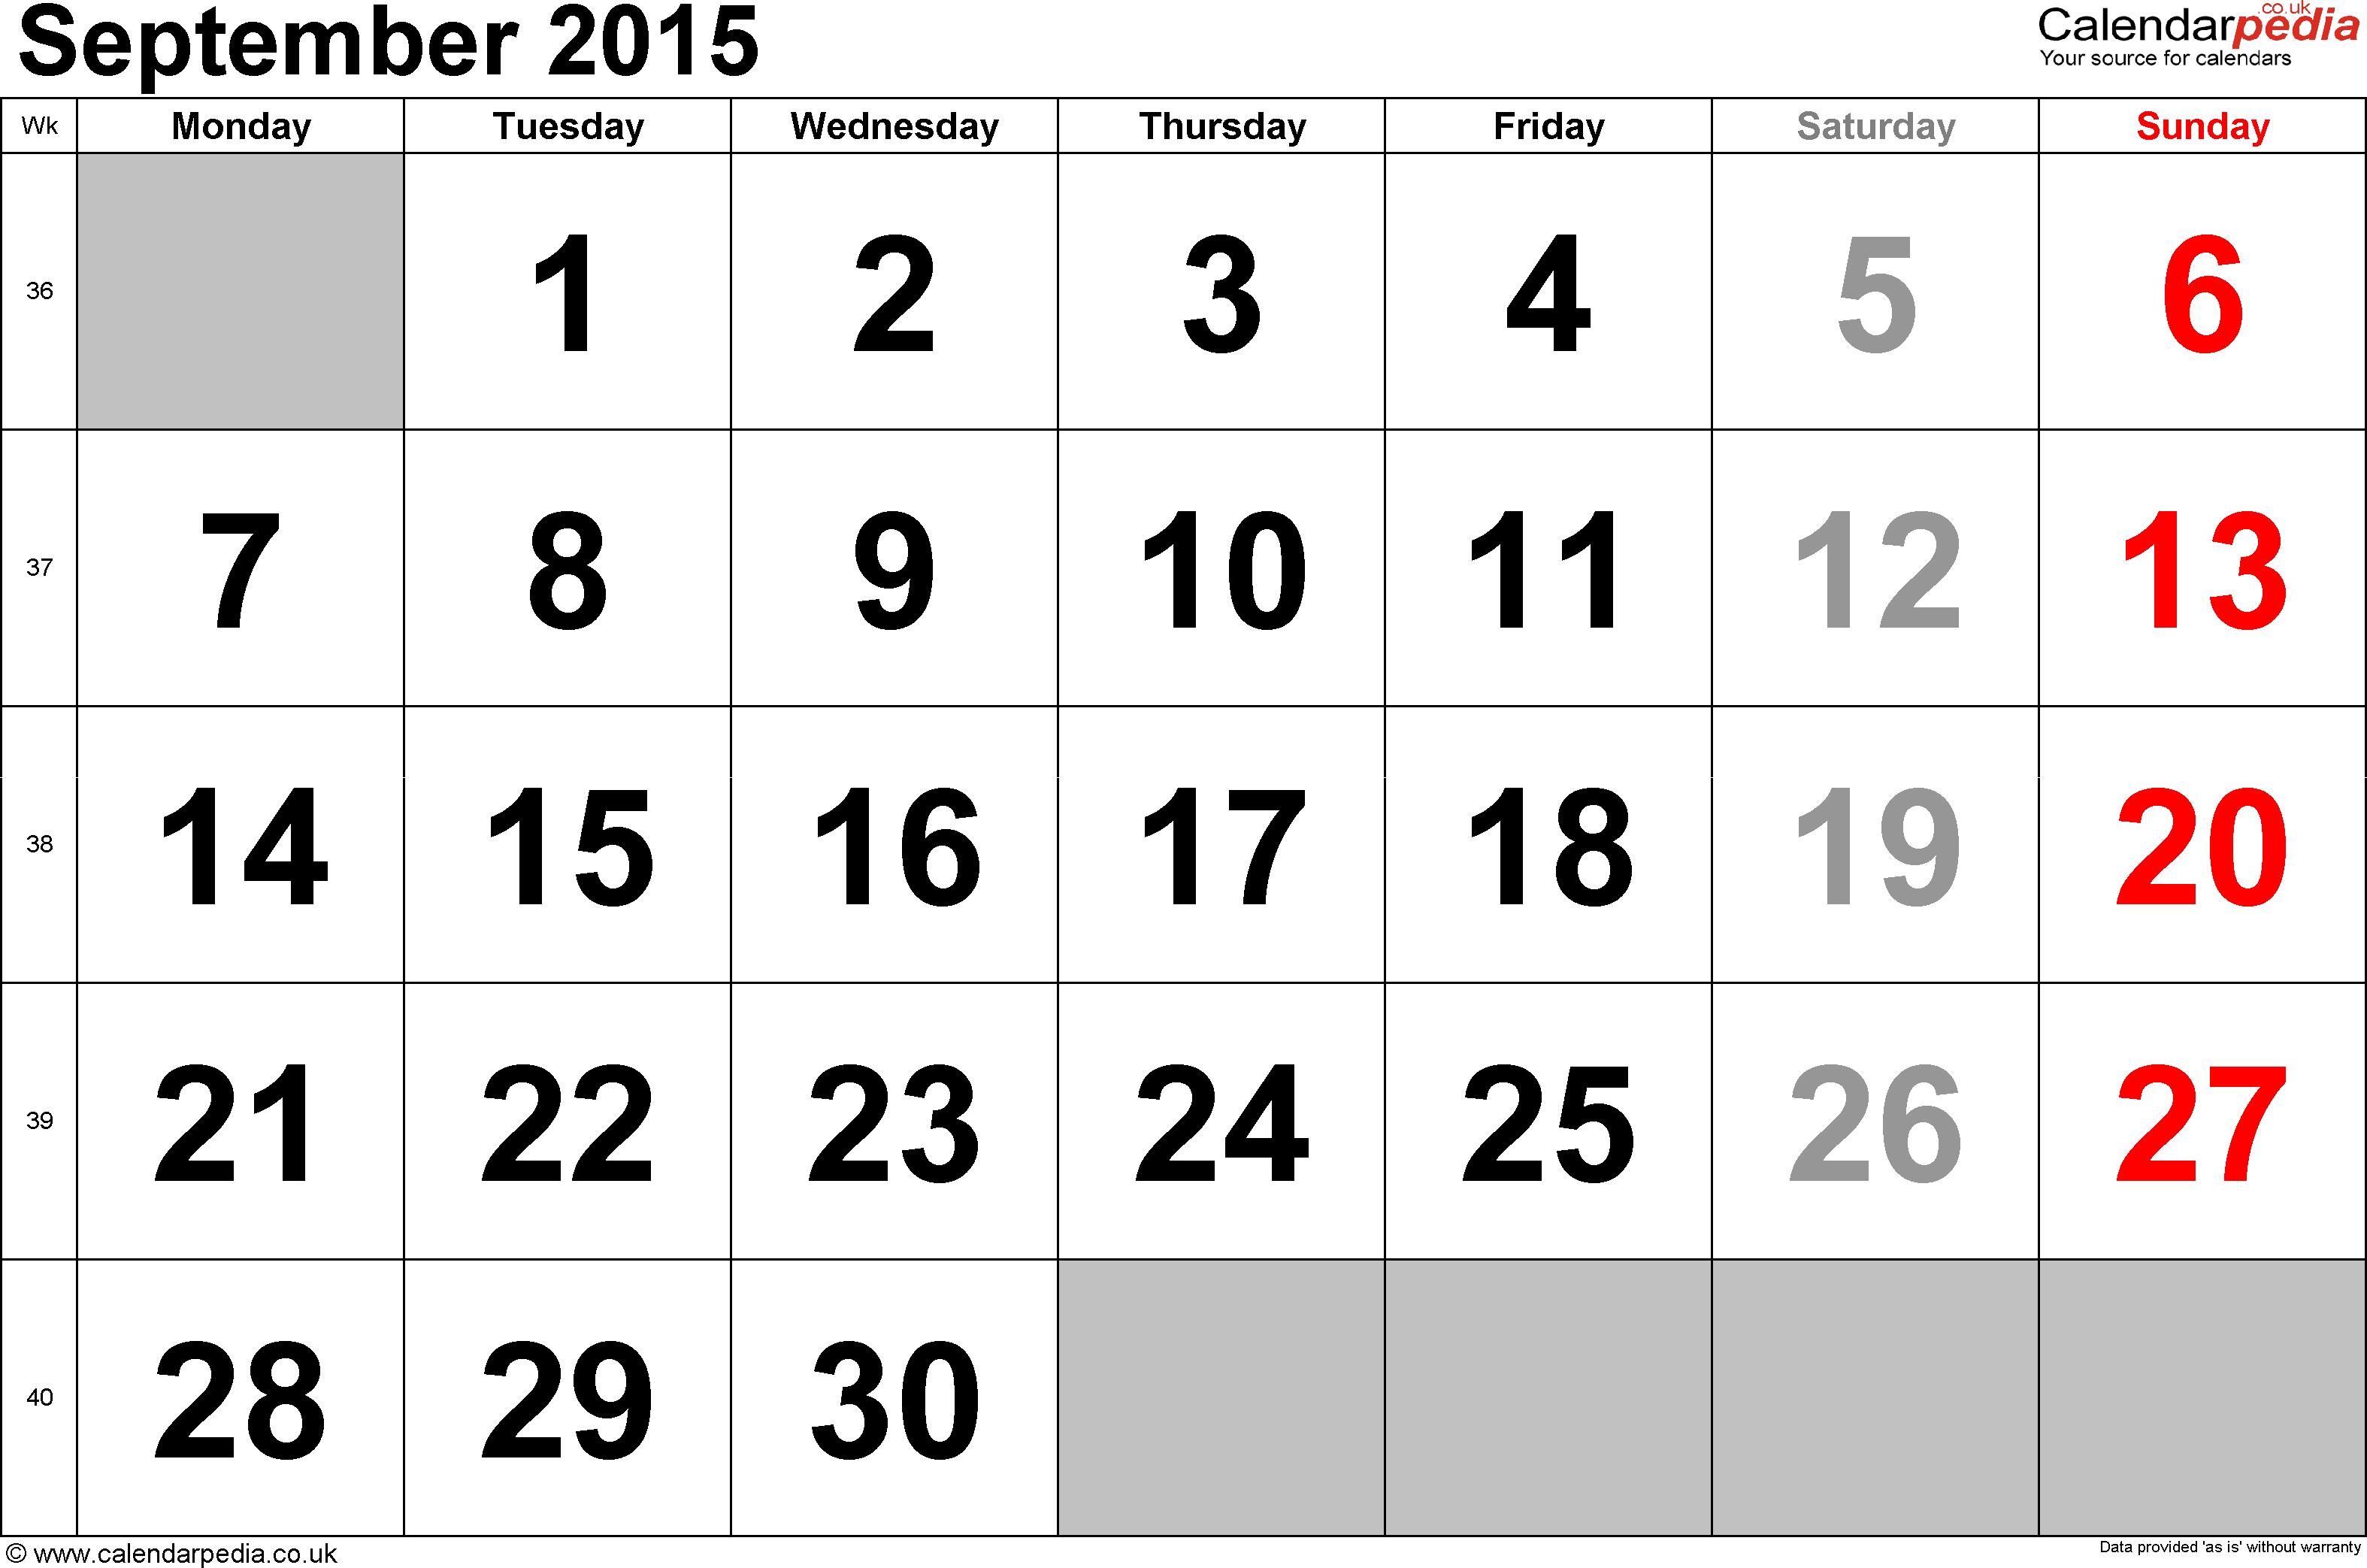 Cute September 2015 Calendar Printable And Templates September 2015 Calendar August Calendar Monthly Calendar Template November Calendar